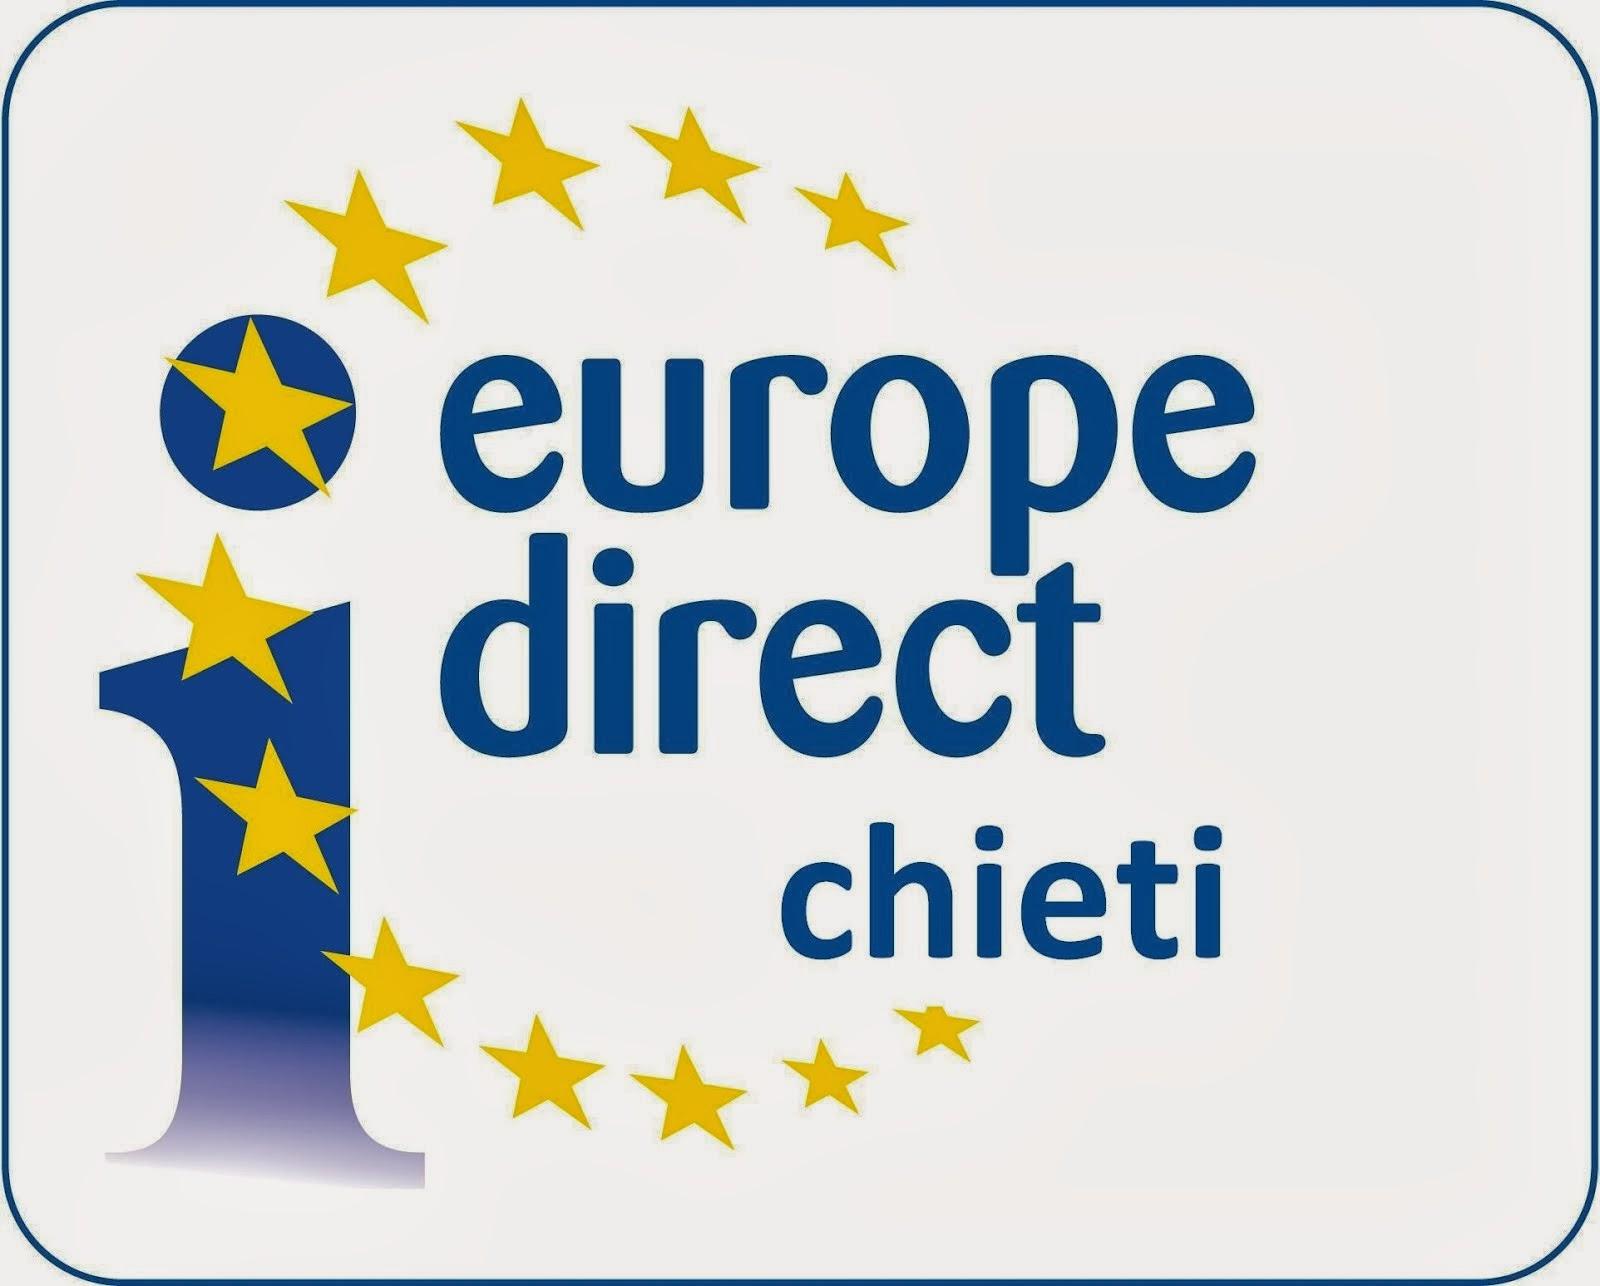 EUROPE DIRECT CHIETI